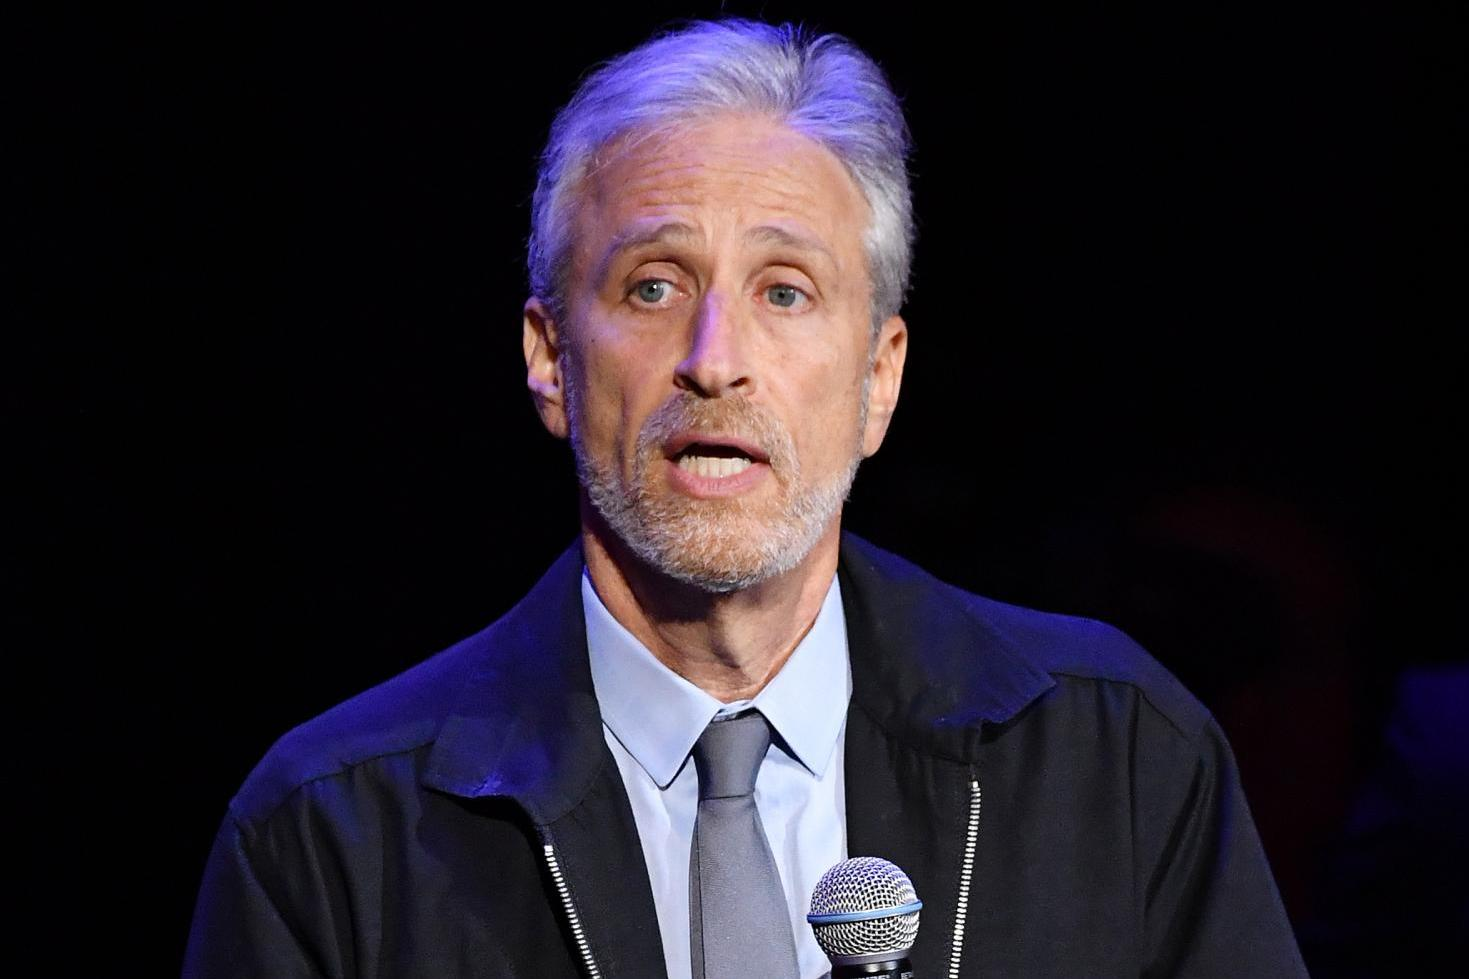 Jon Stewart discusses lack of diversity on The Daily Show: 'We kept hiring white dudes' thumbnail